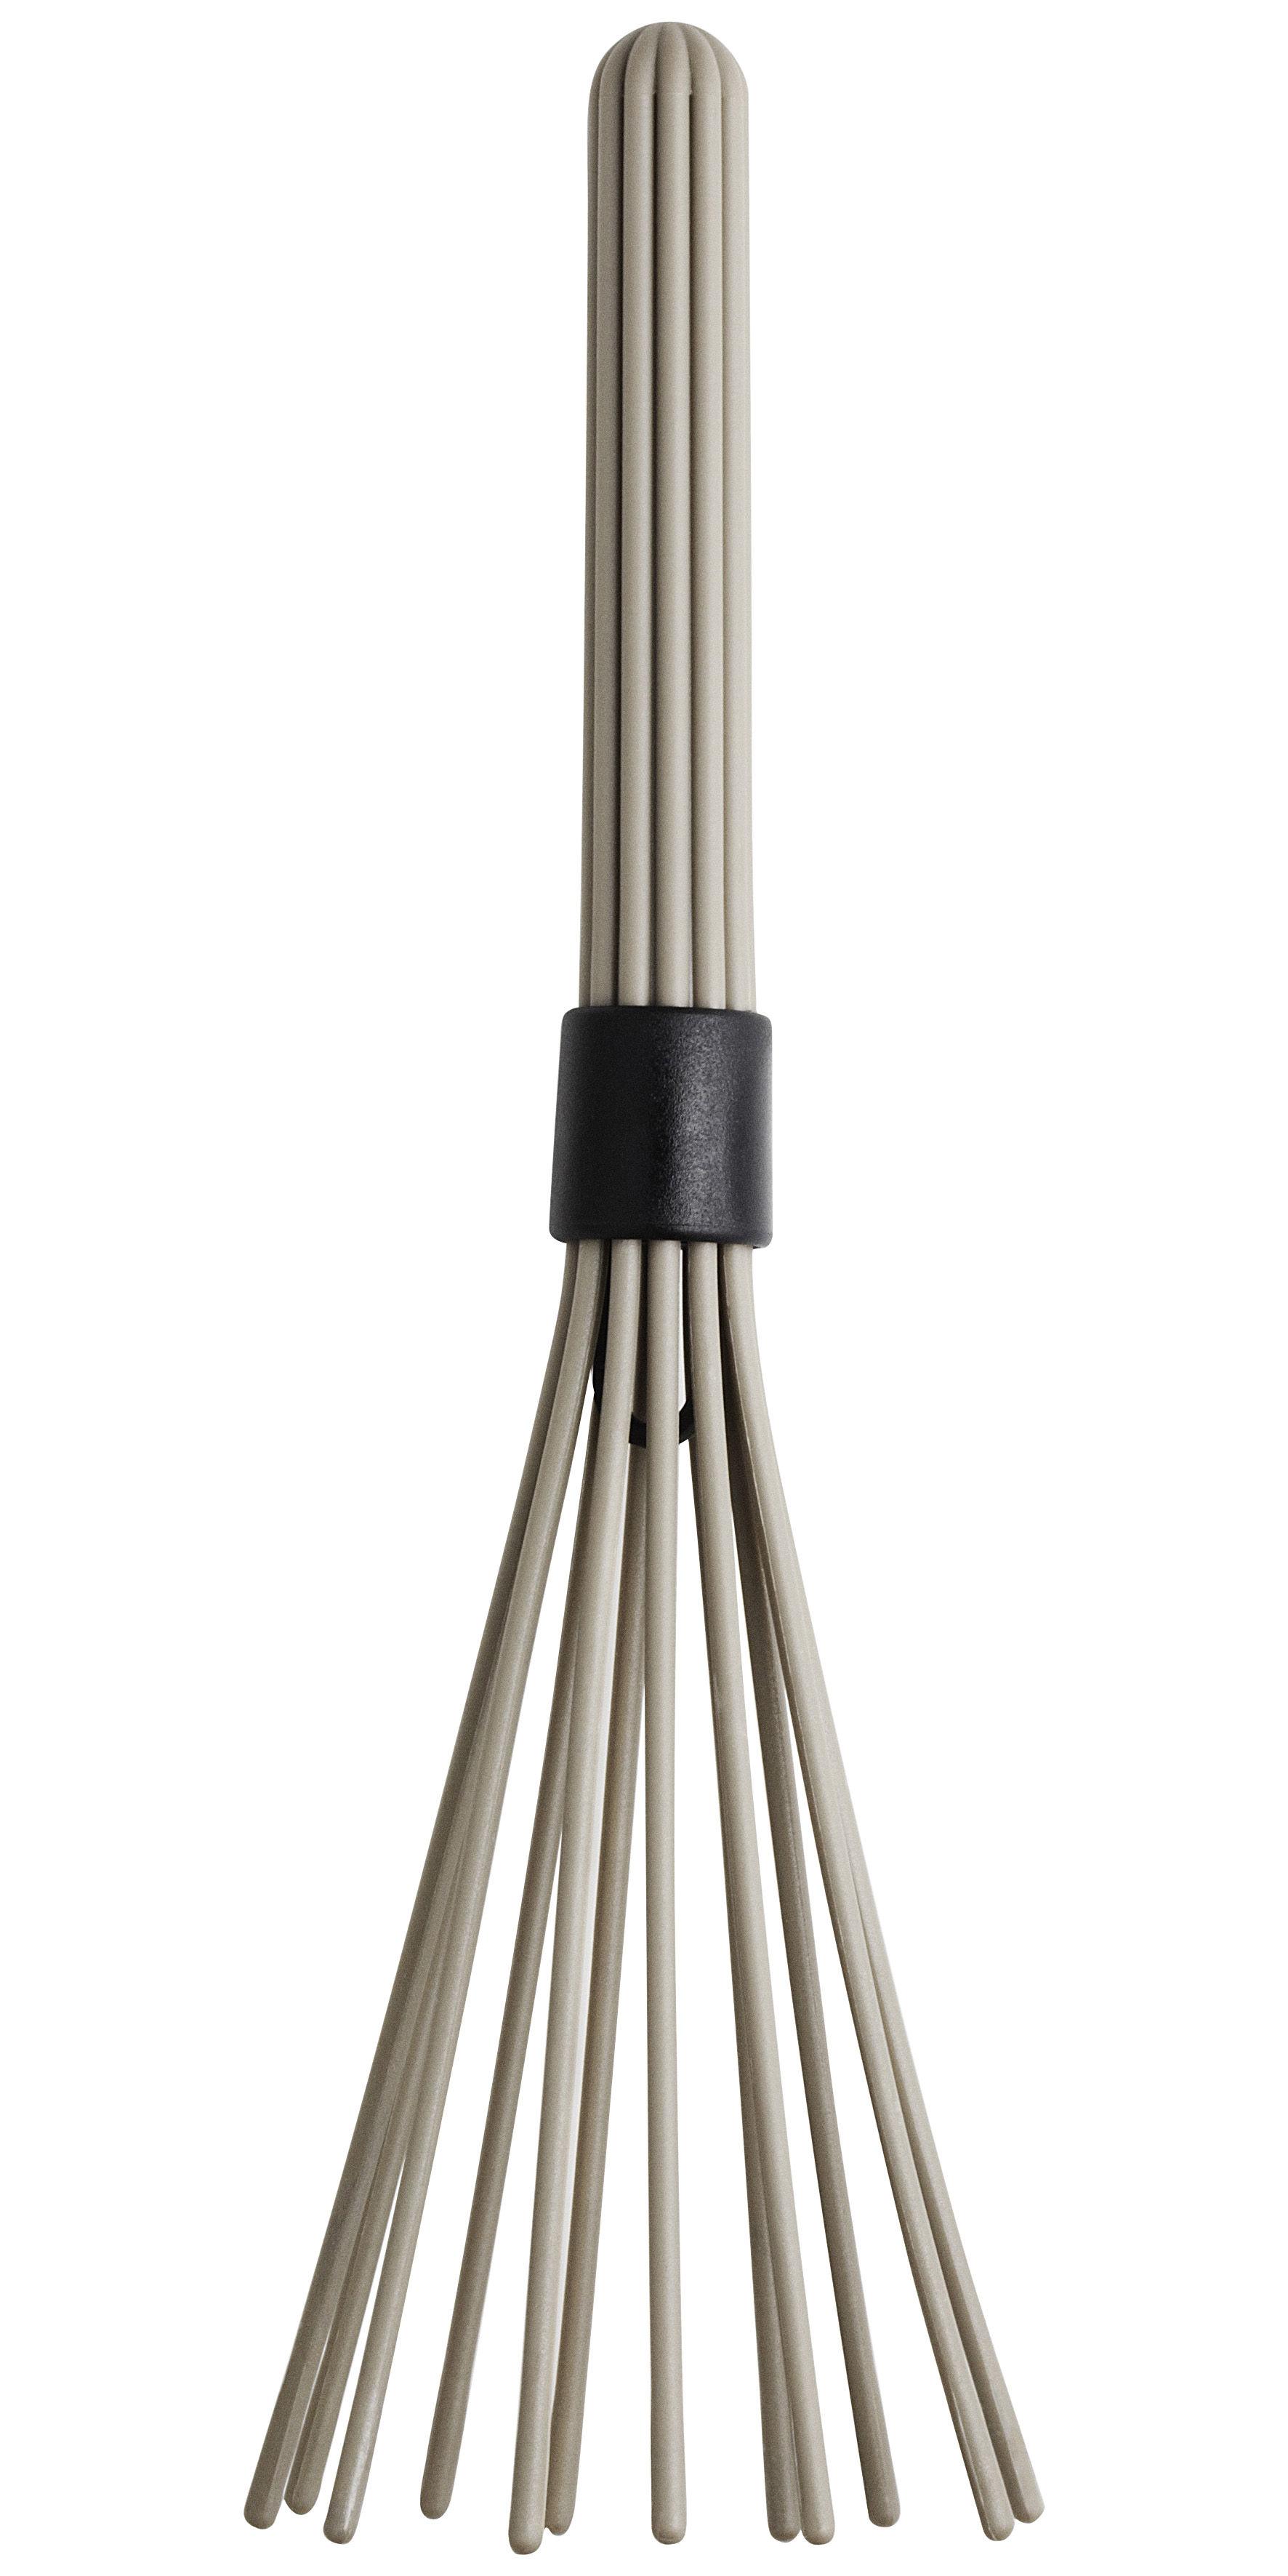 Kitchenware - Kitchen Equipment - Beater Whisk - Foldable by Normann Copenhagen - Grey - Nylon